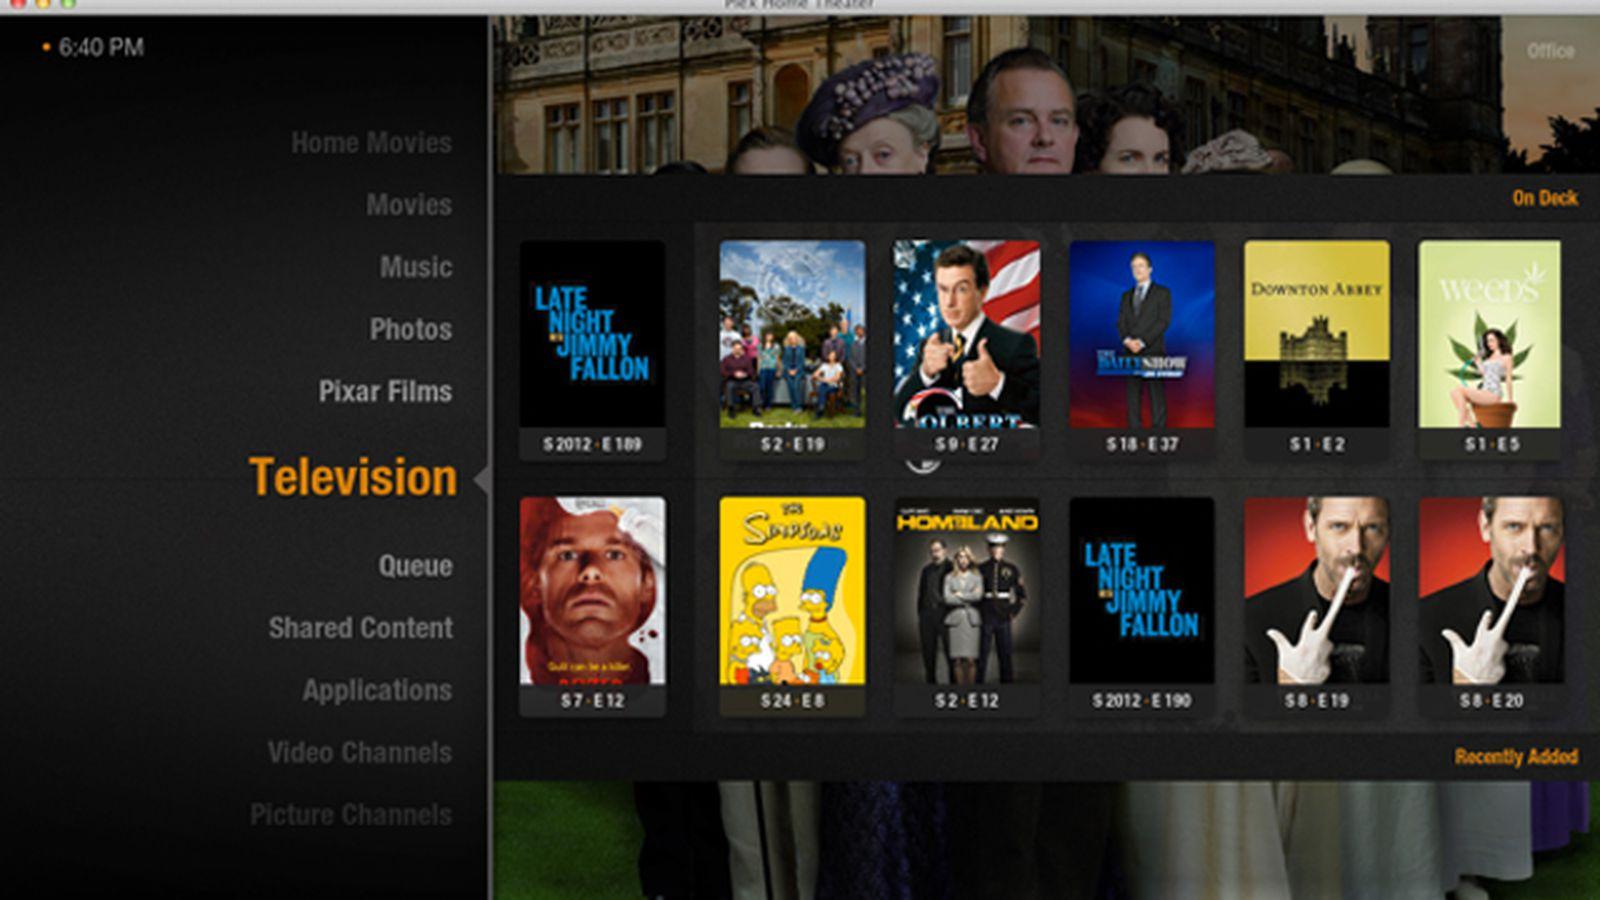 3d Server Wallpaper Plex Desktop App Rebranded As Plex Home Theater Adds